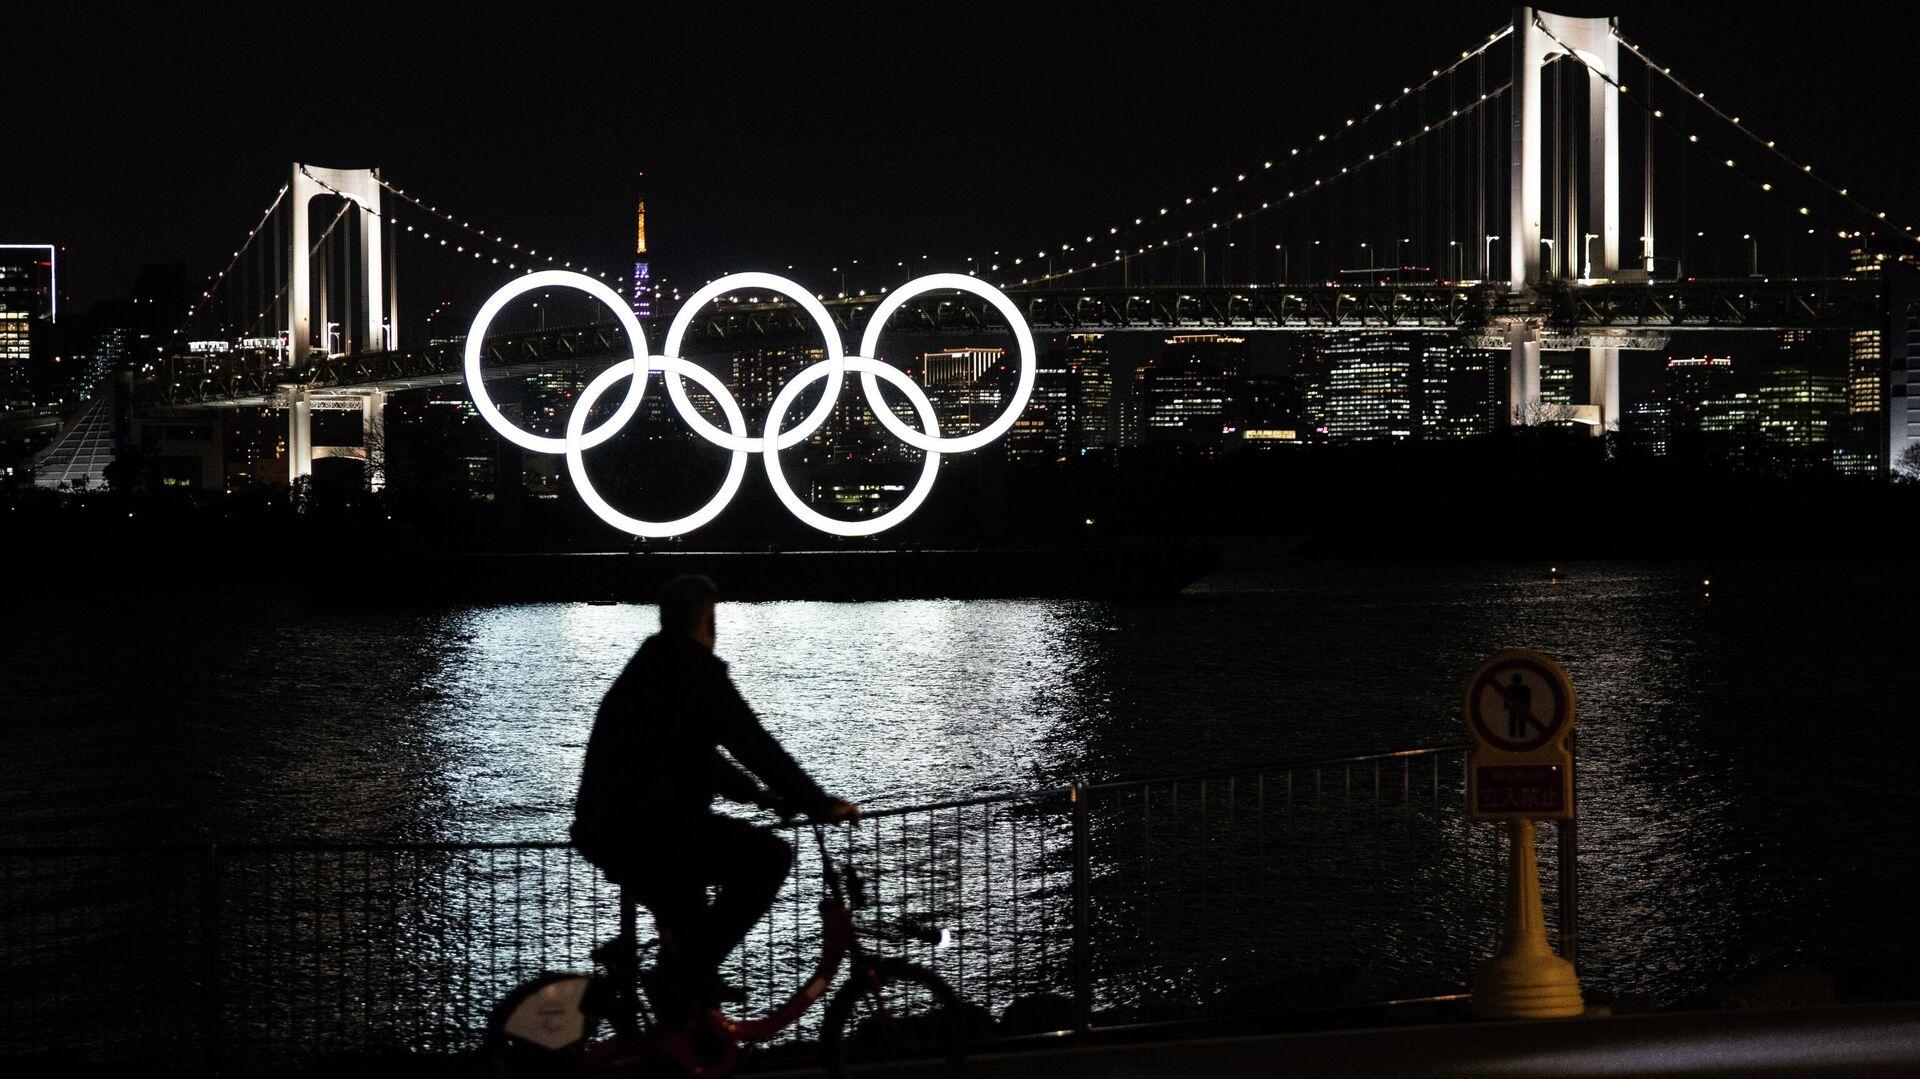 Олимпийские кольца в Токио - РИА Новости, 1920, 17.07.2021